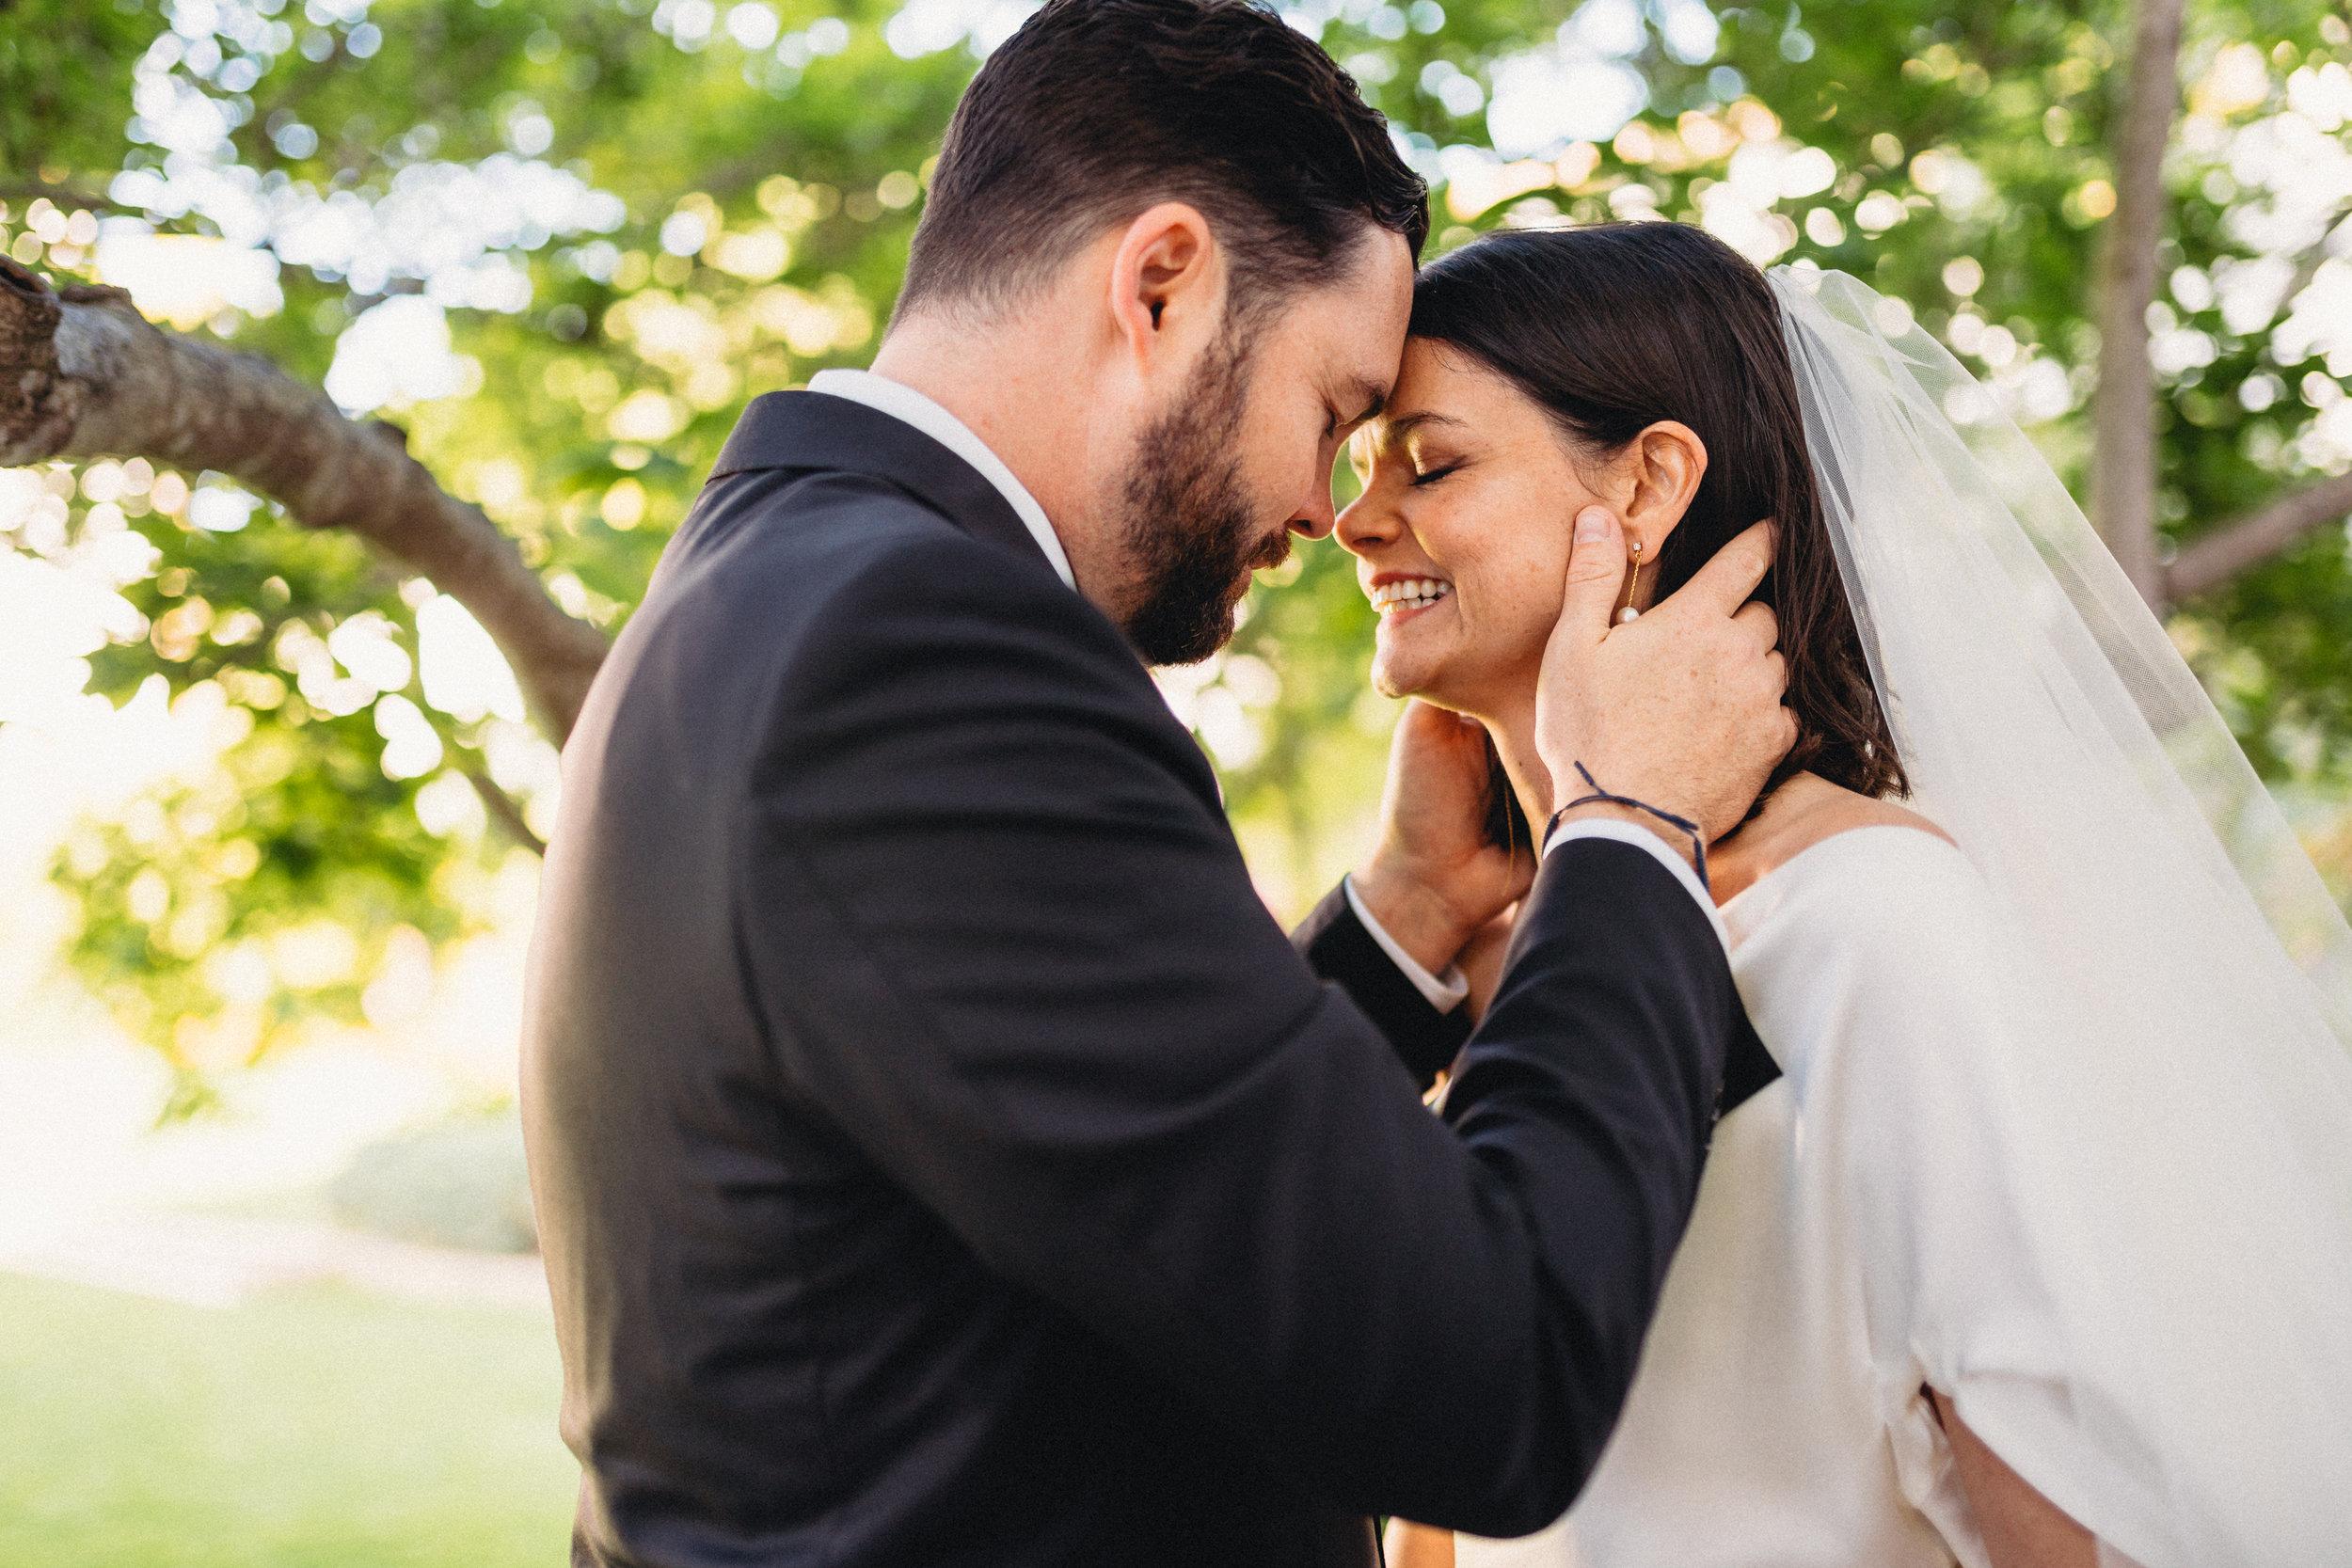 wedding-photography-santa-barbara-courthouse-rebeccaylasotras-140.jpg